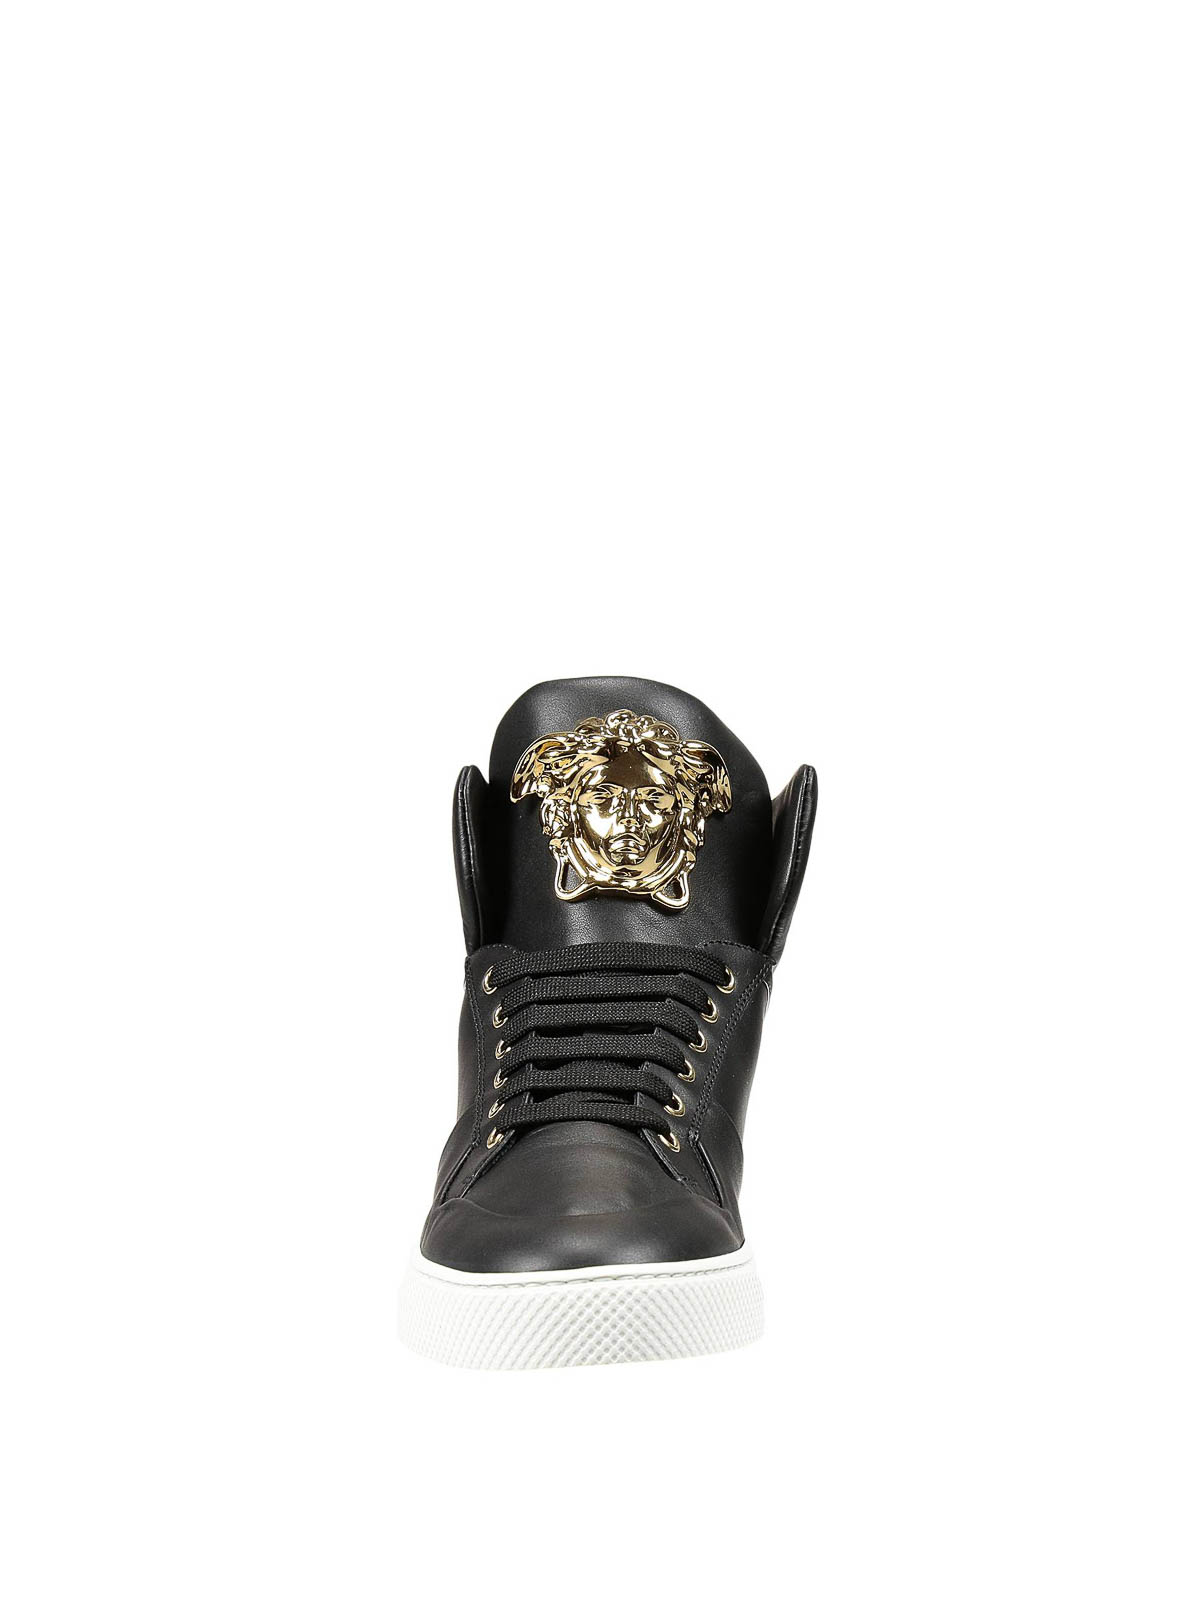 Versace - Sneaker alte con Medusa - sneakers - DSU5644 DVG3G ...